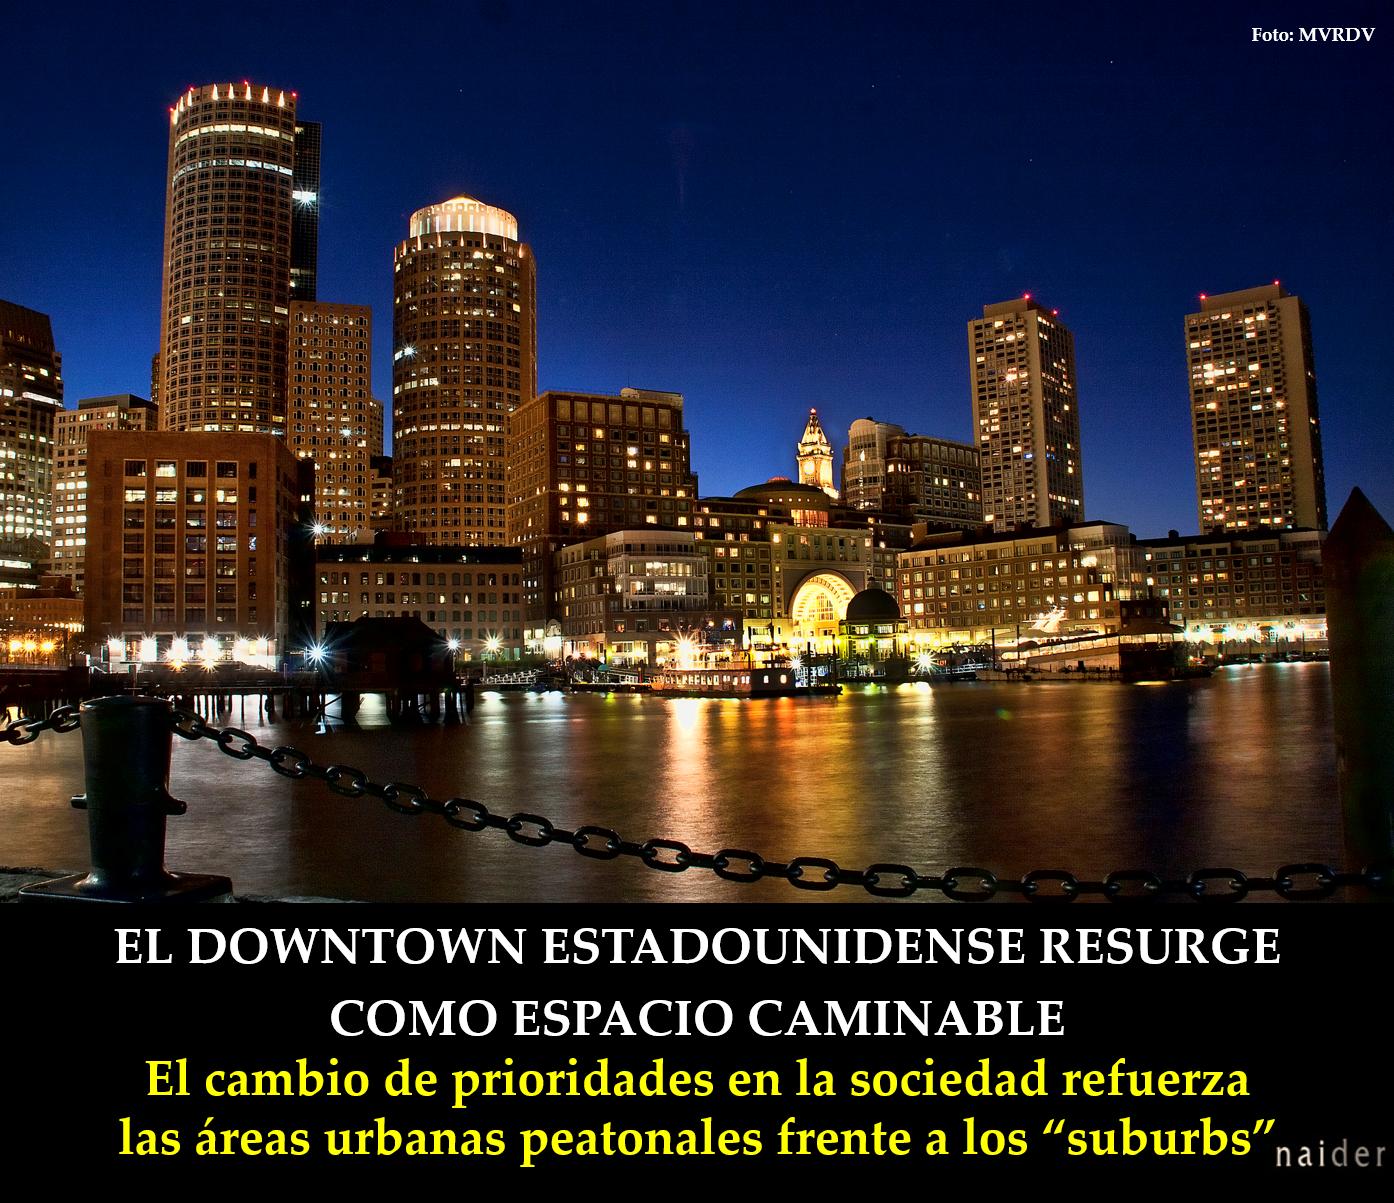 el downtown estadounidense infopost